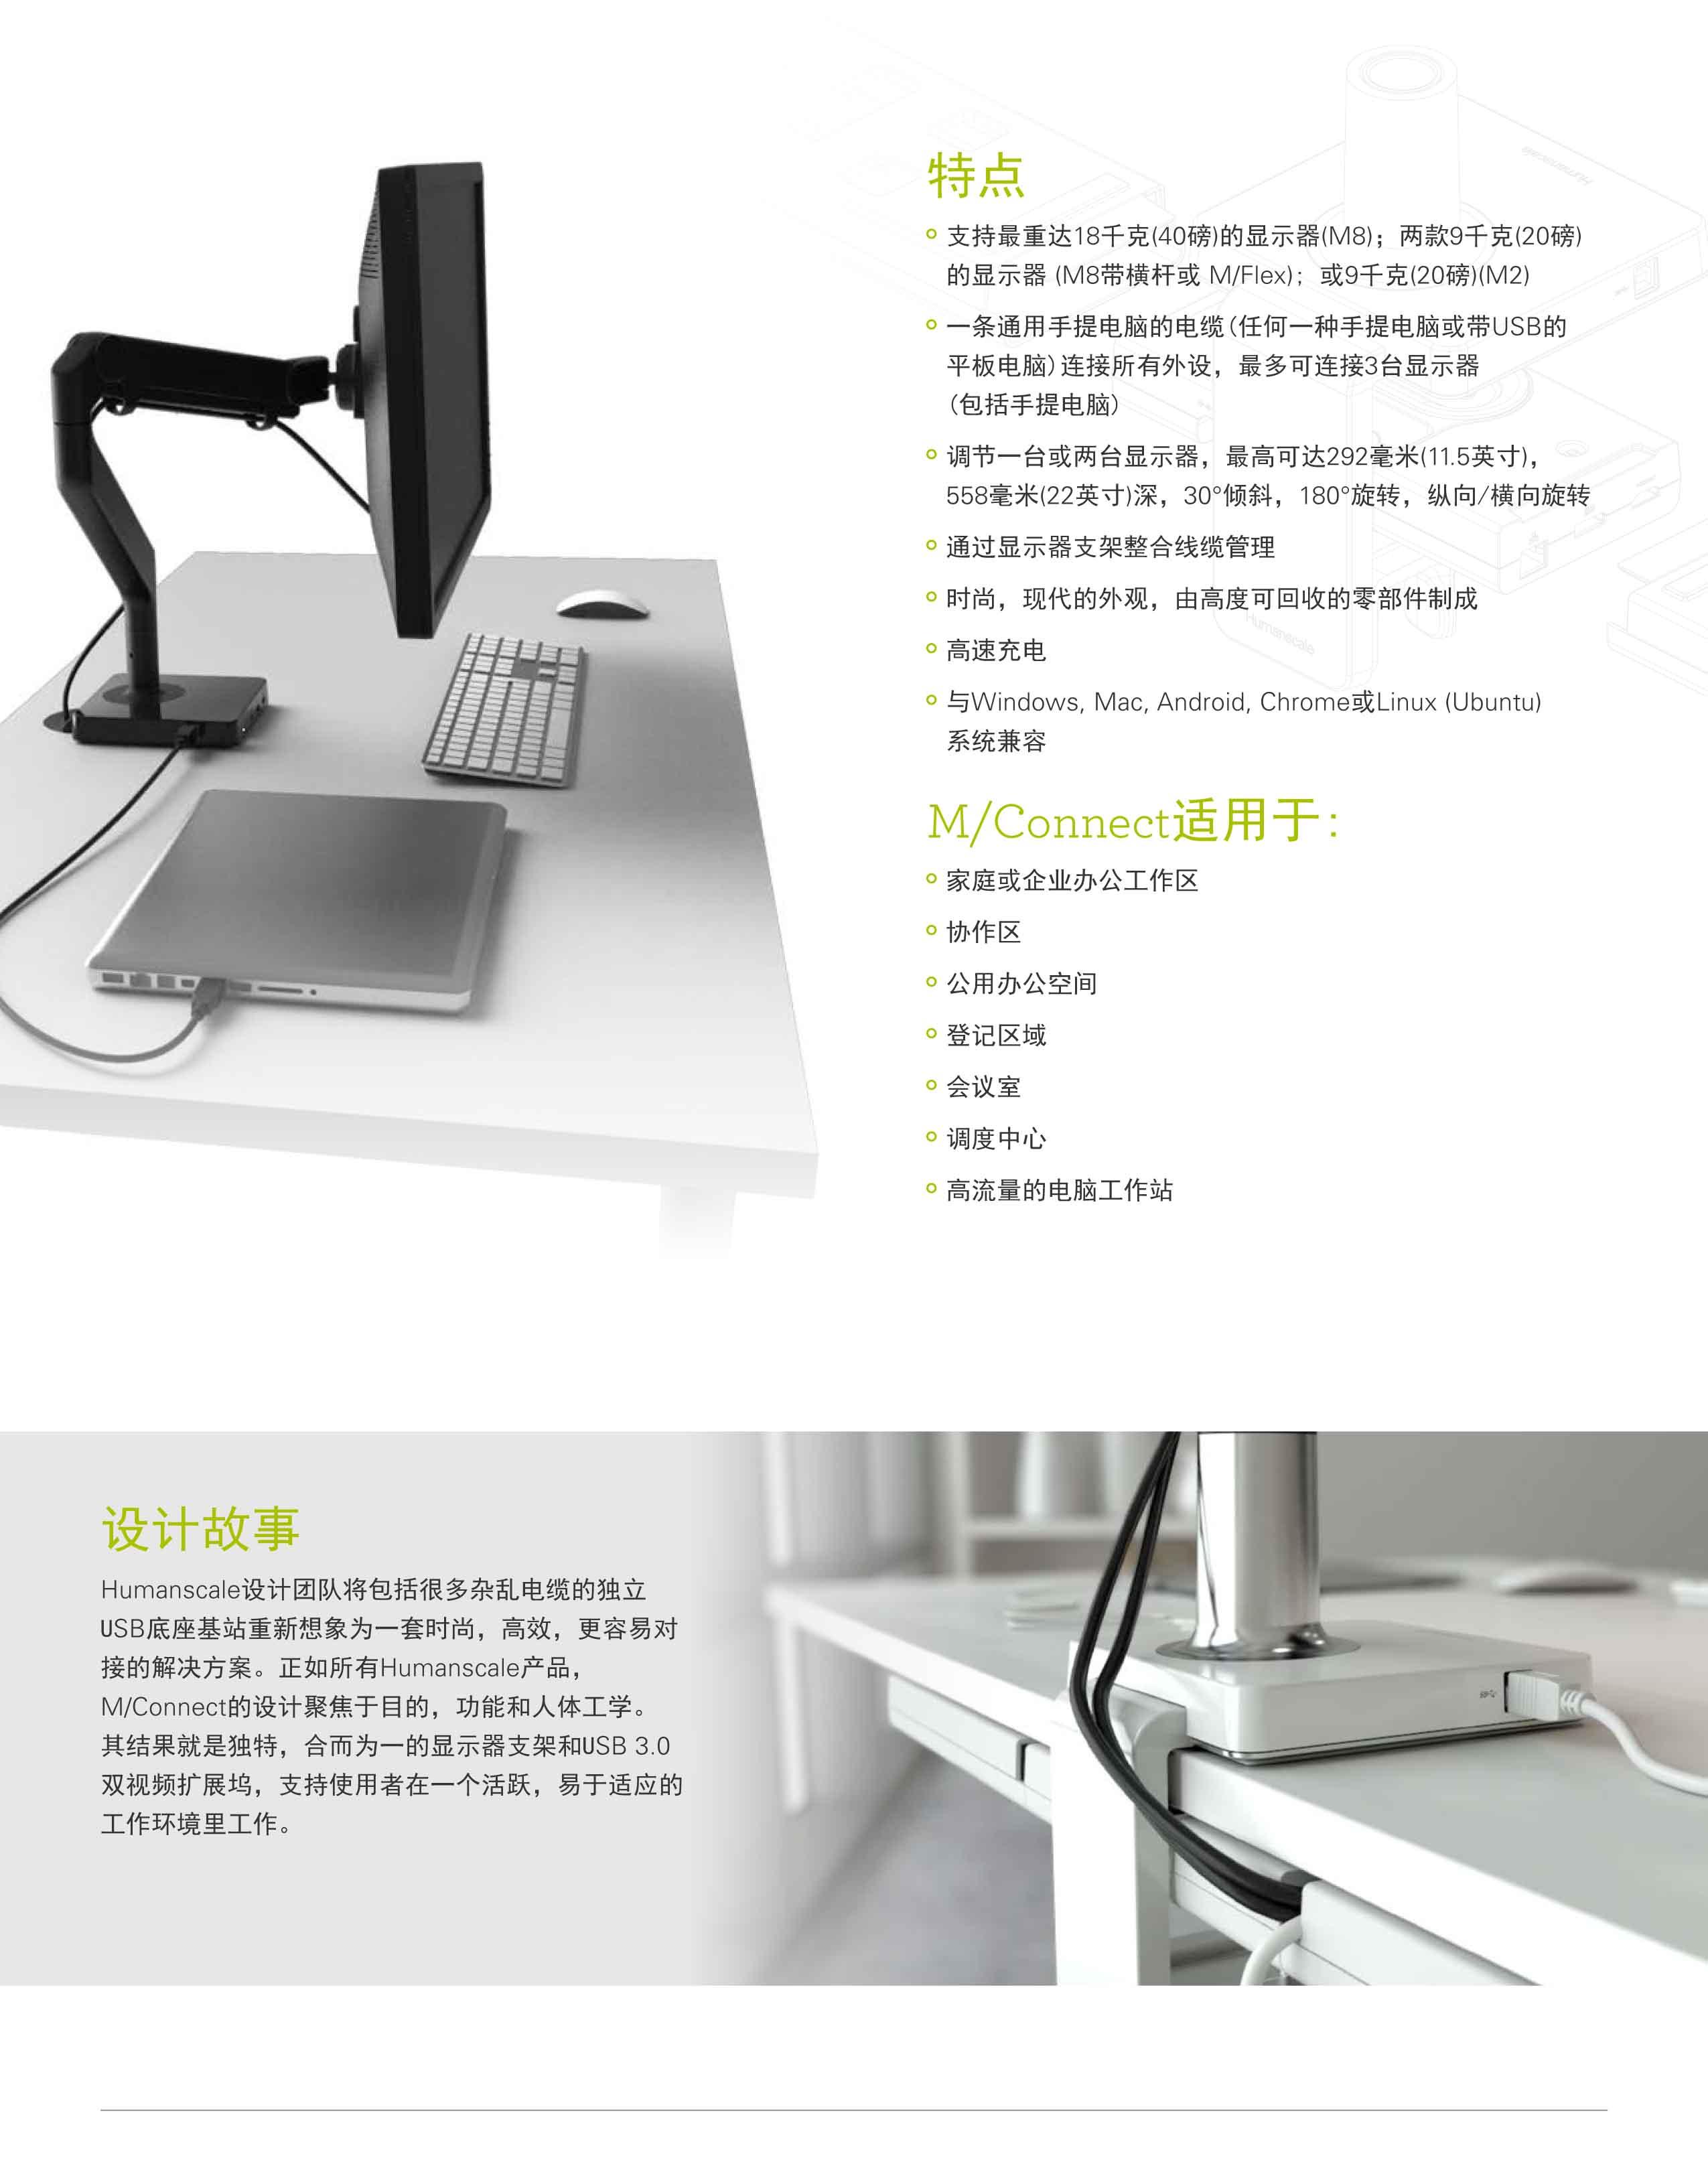 7MConnect-3.jpg